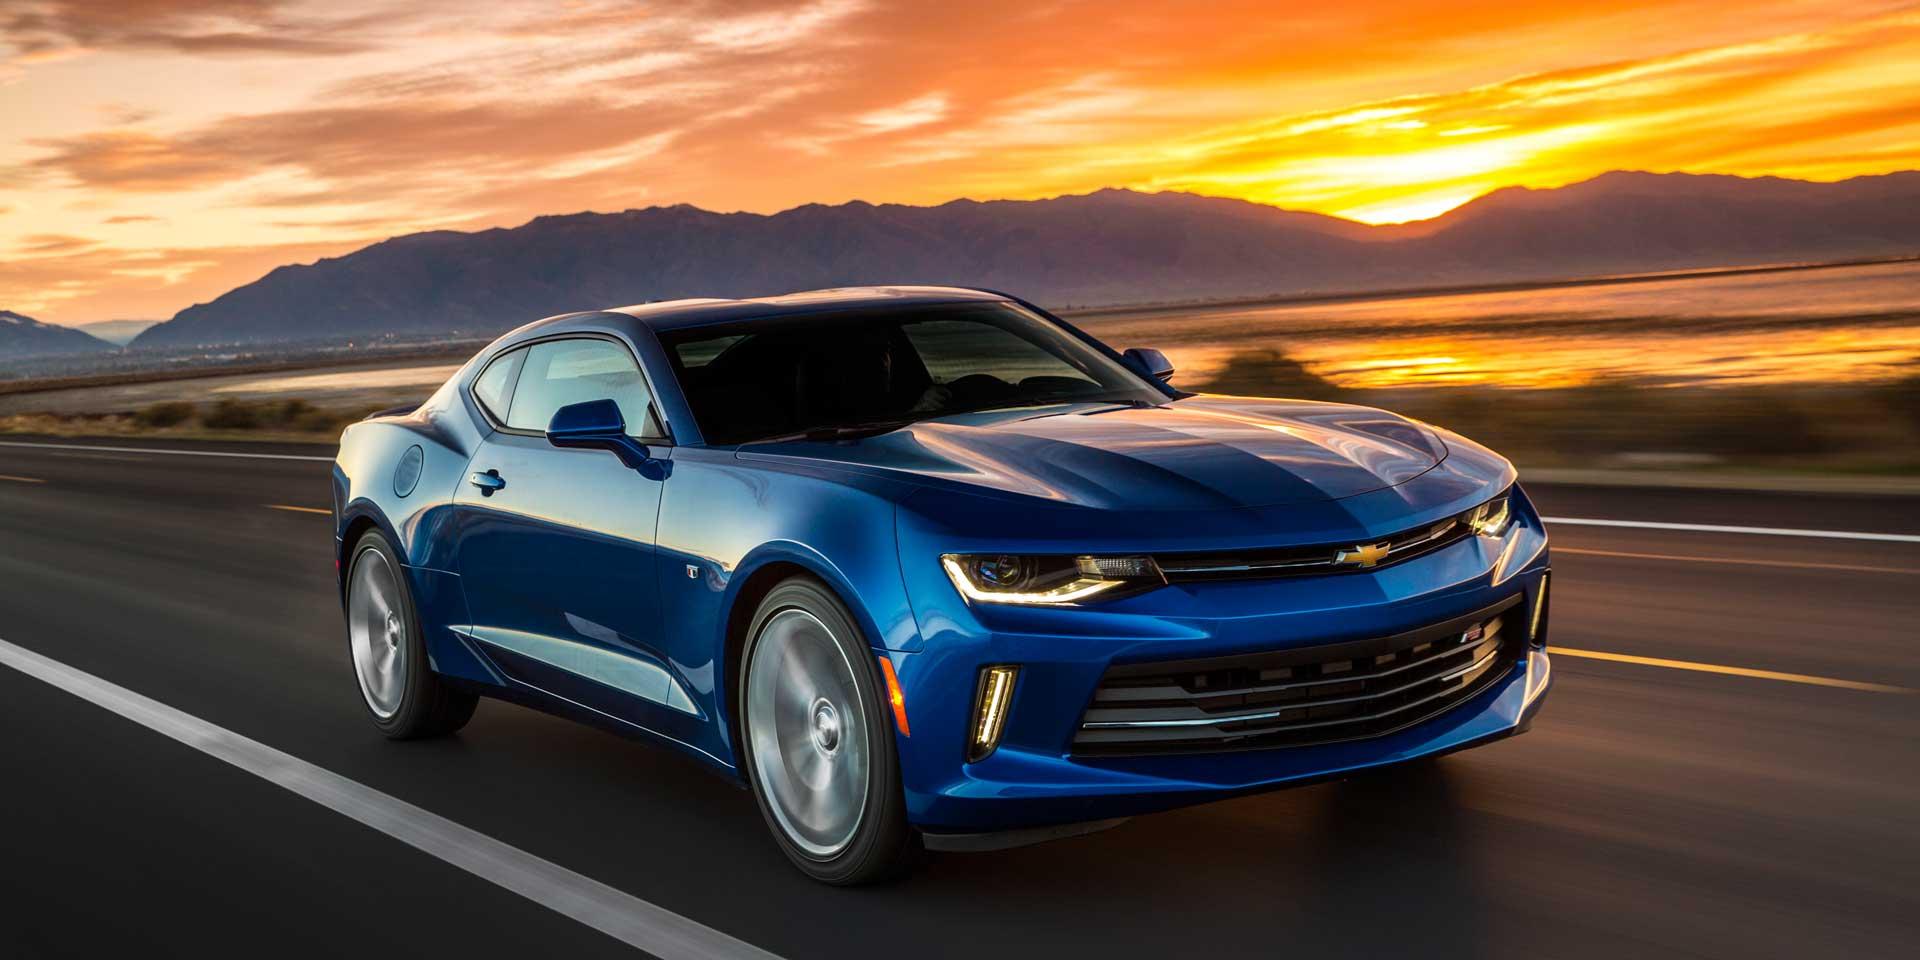 2018 - Chevrolet - Camaro - Vehicles on Display | Chicago Auto Show